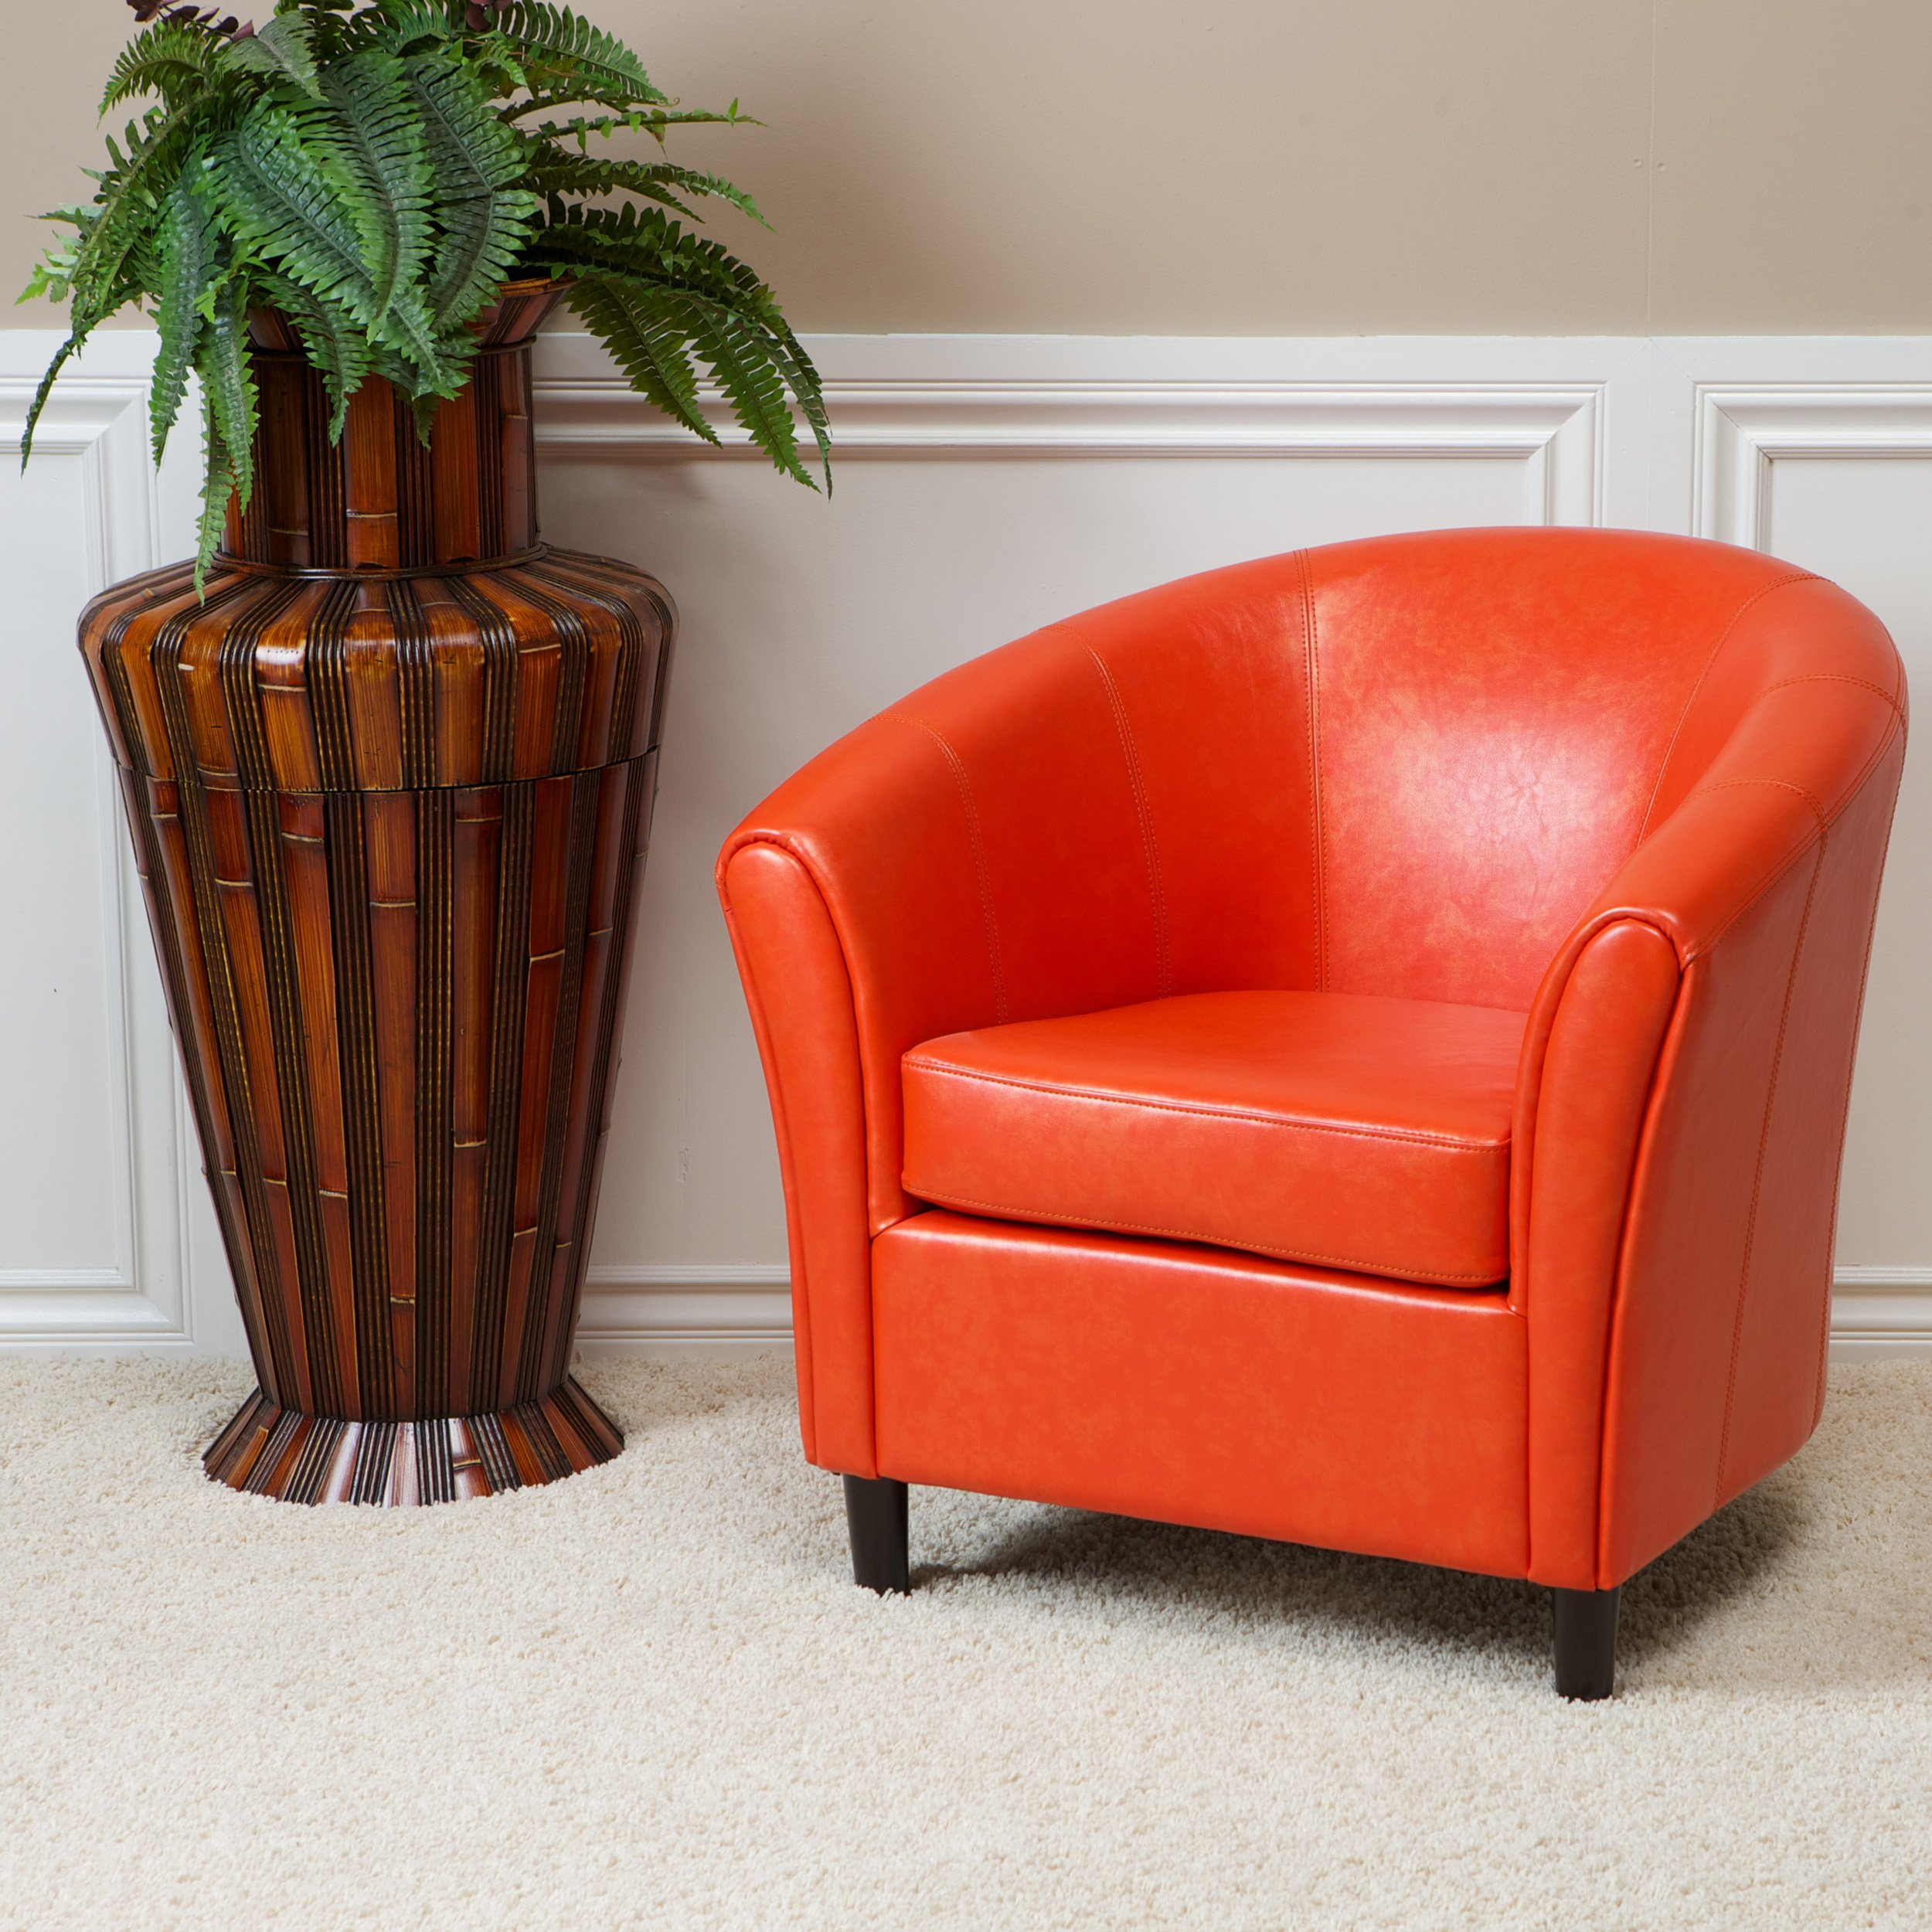 Best Selling Napoli Orange Leather Club Chair FurnitureNdecor